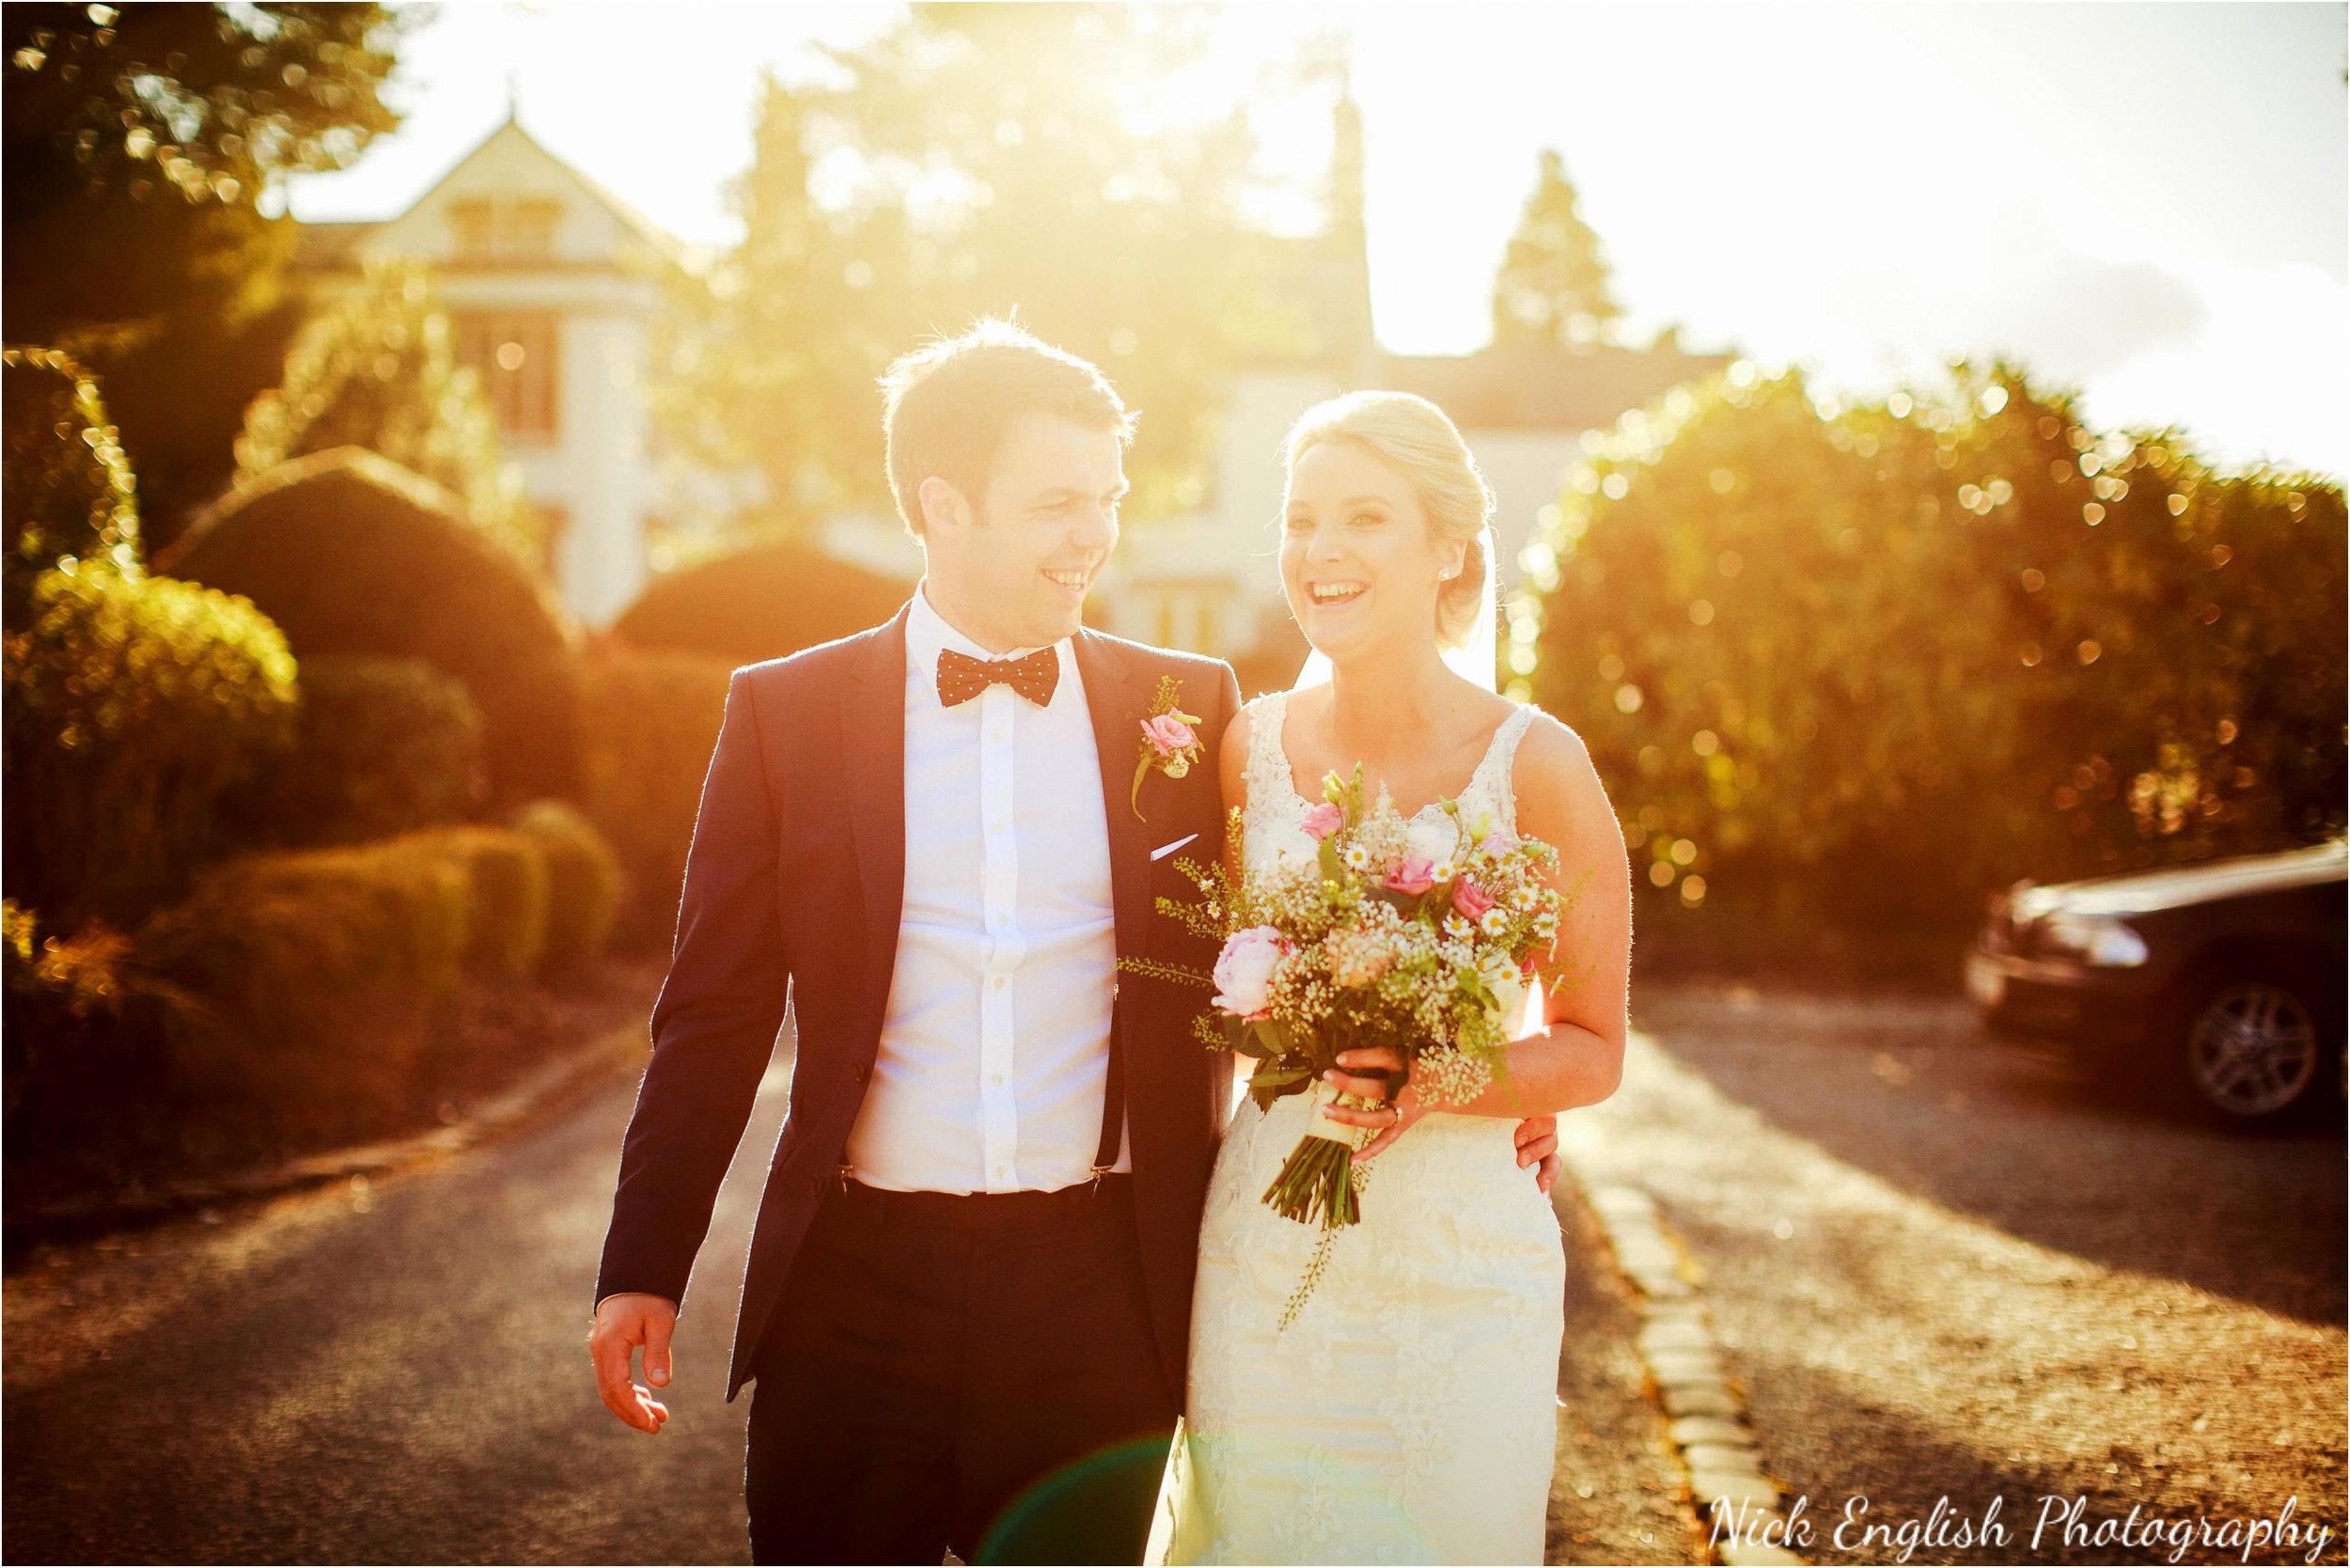 Mitton Hall Bride & Groom sunset walk